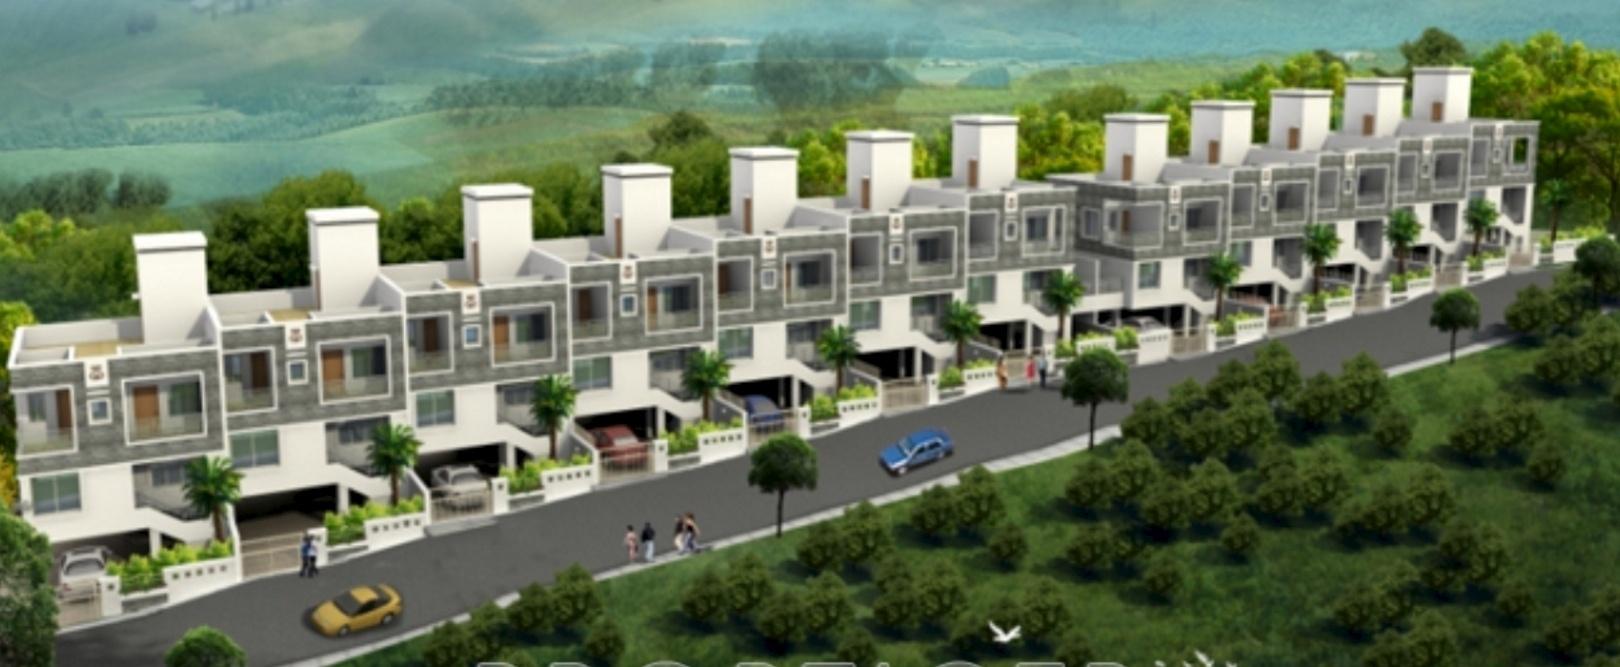 Elevation Stones Bangalore : Gvn developers stepping stone in dhayari pune price